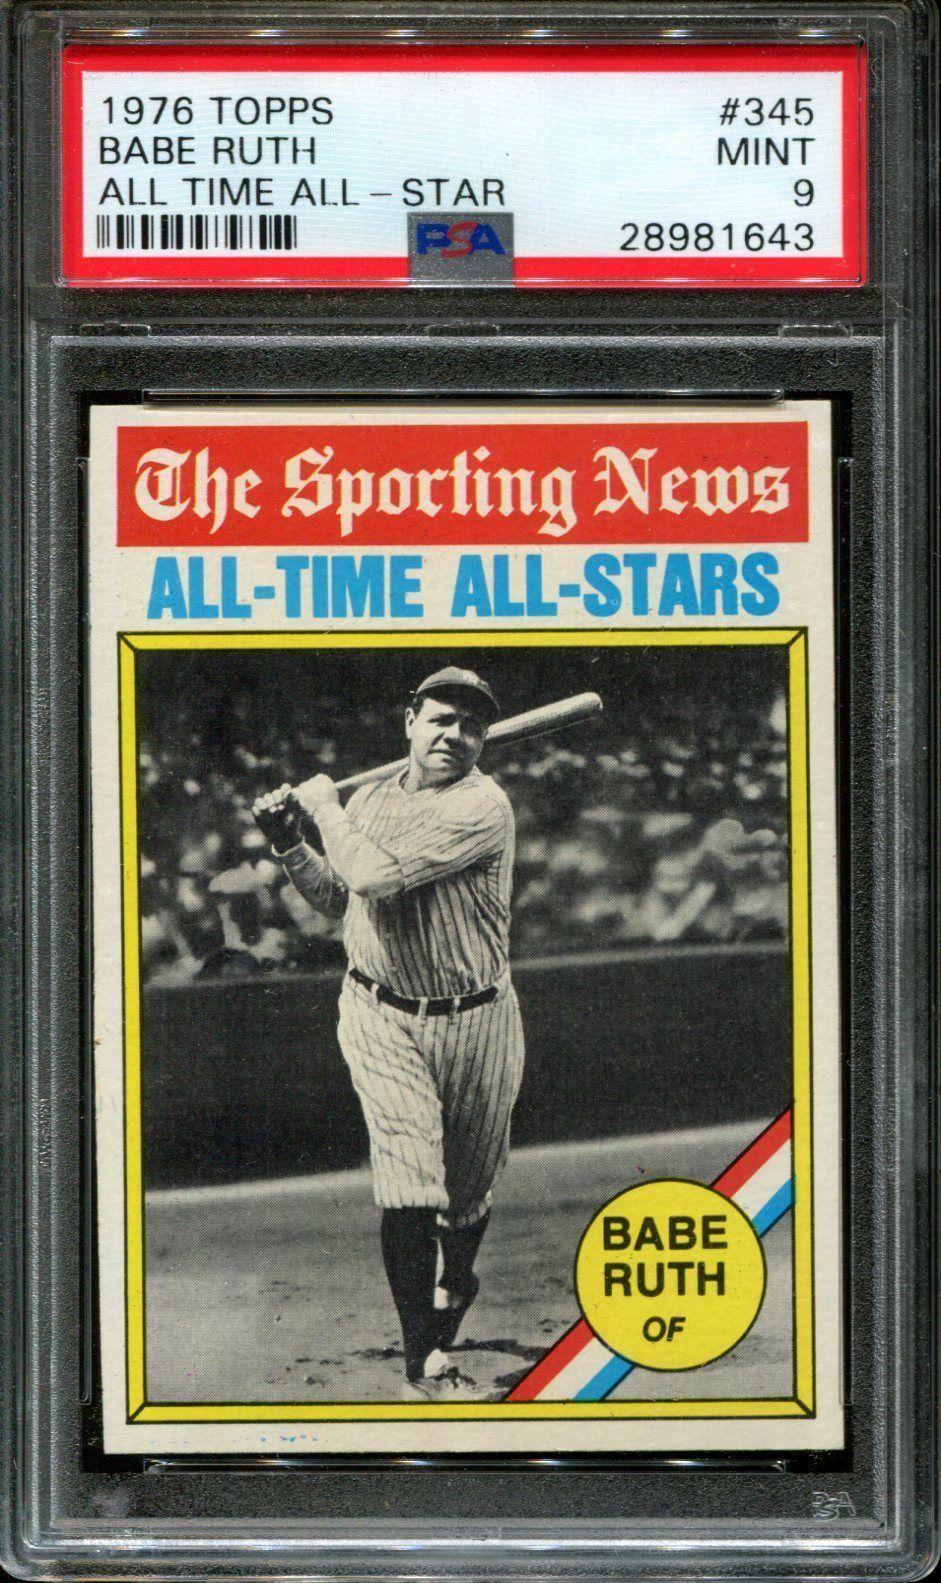 Babe ruth psa 9 mint 1976 topps baseball card yankees